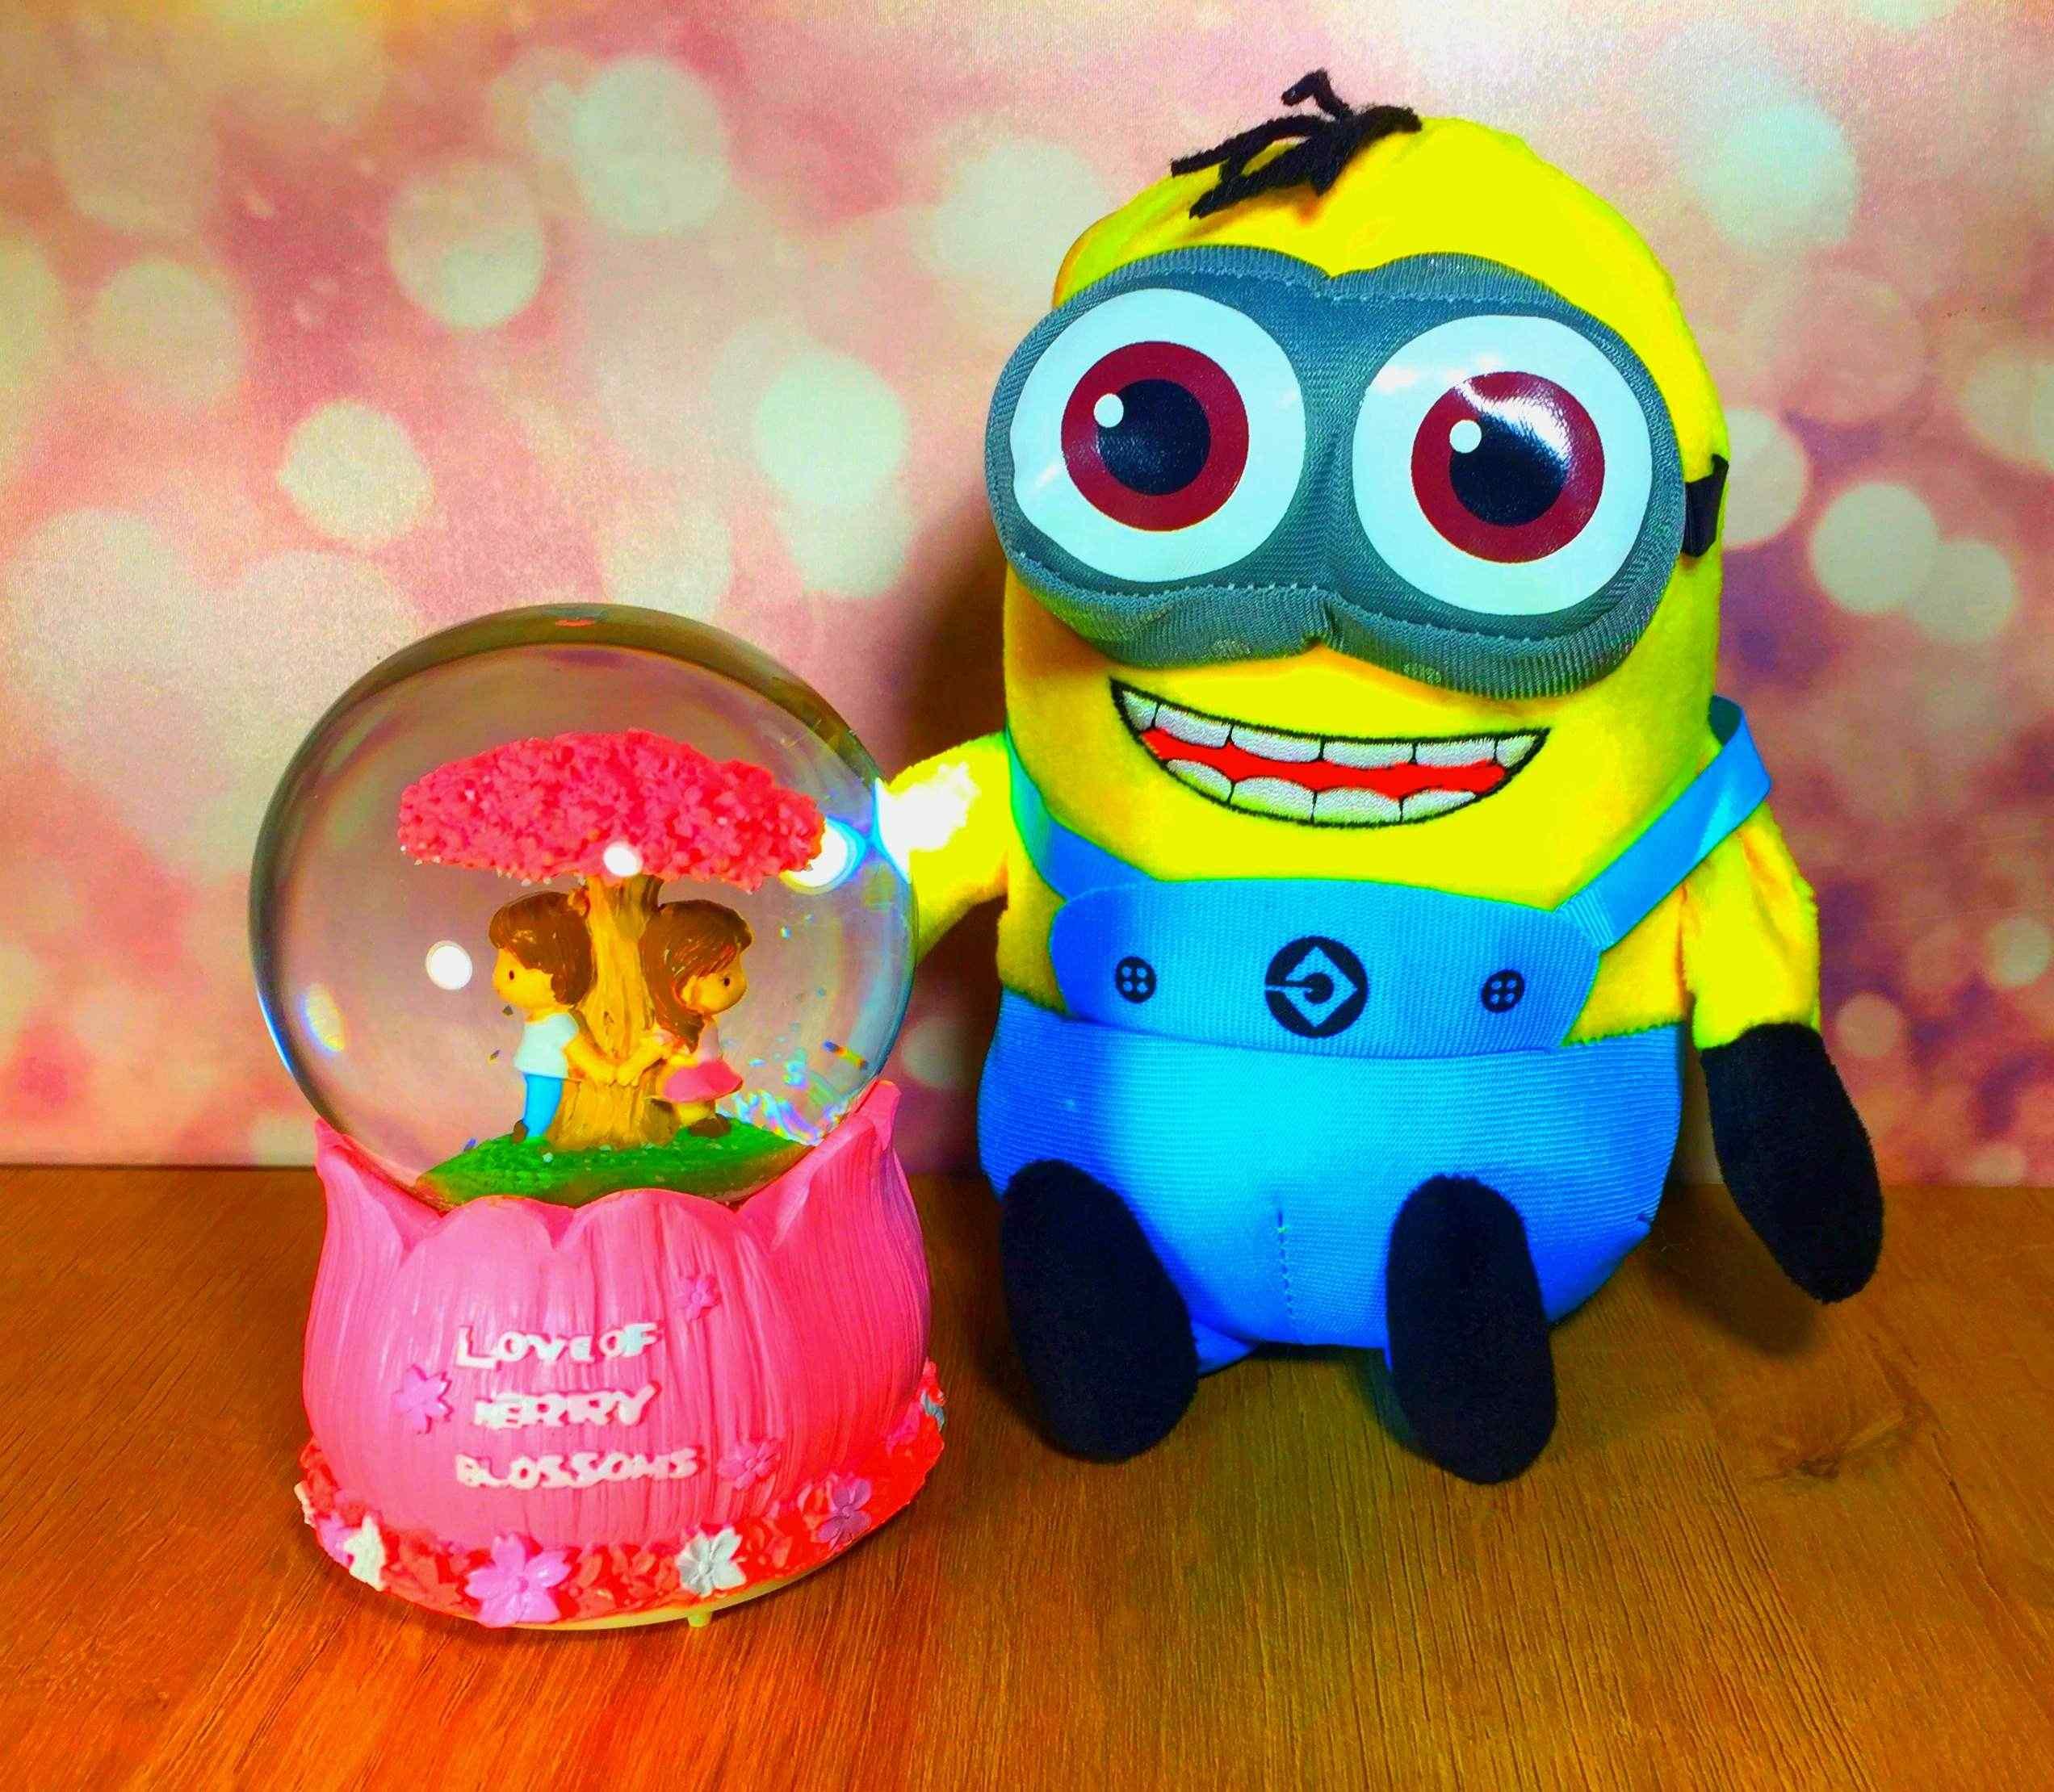 Minions Minyon Peluş Ve Romantik Aşıklar Kar Küresi Seti